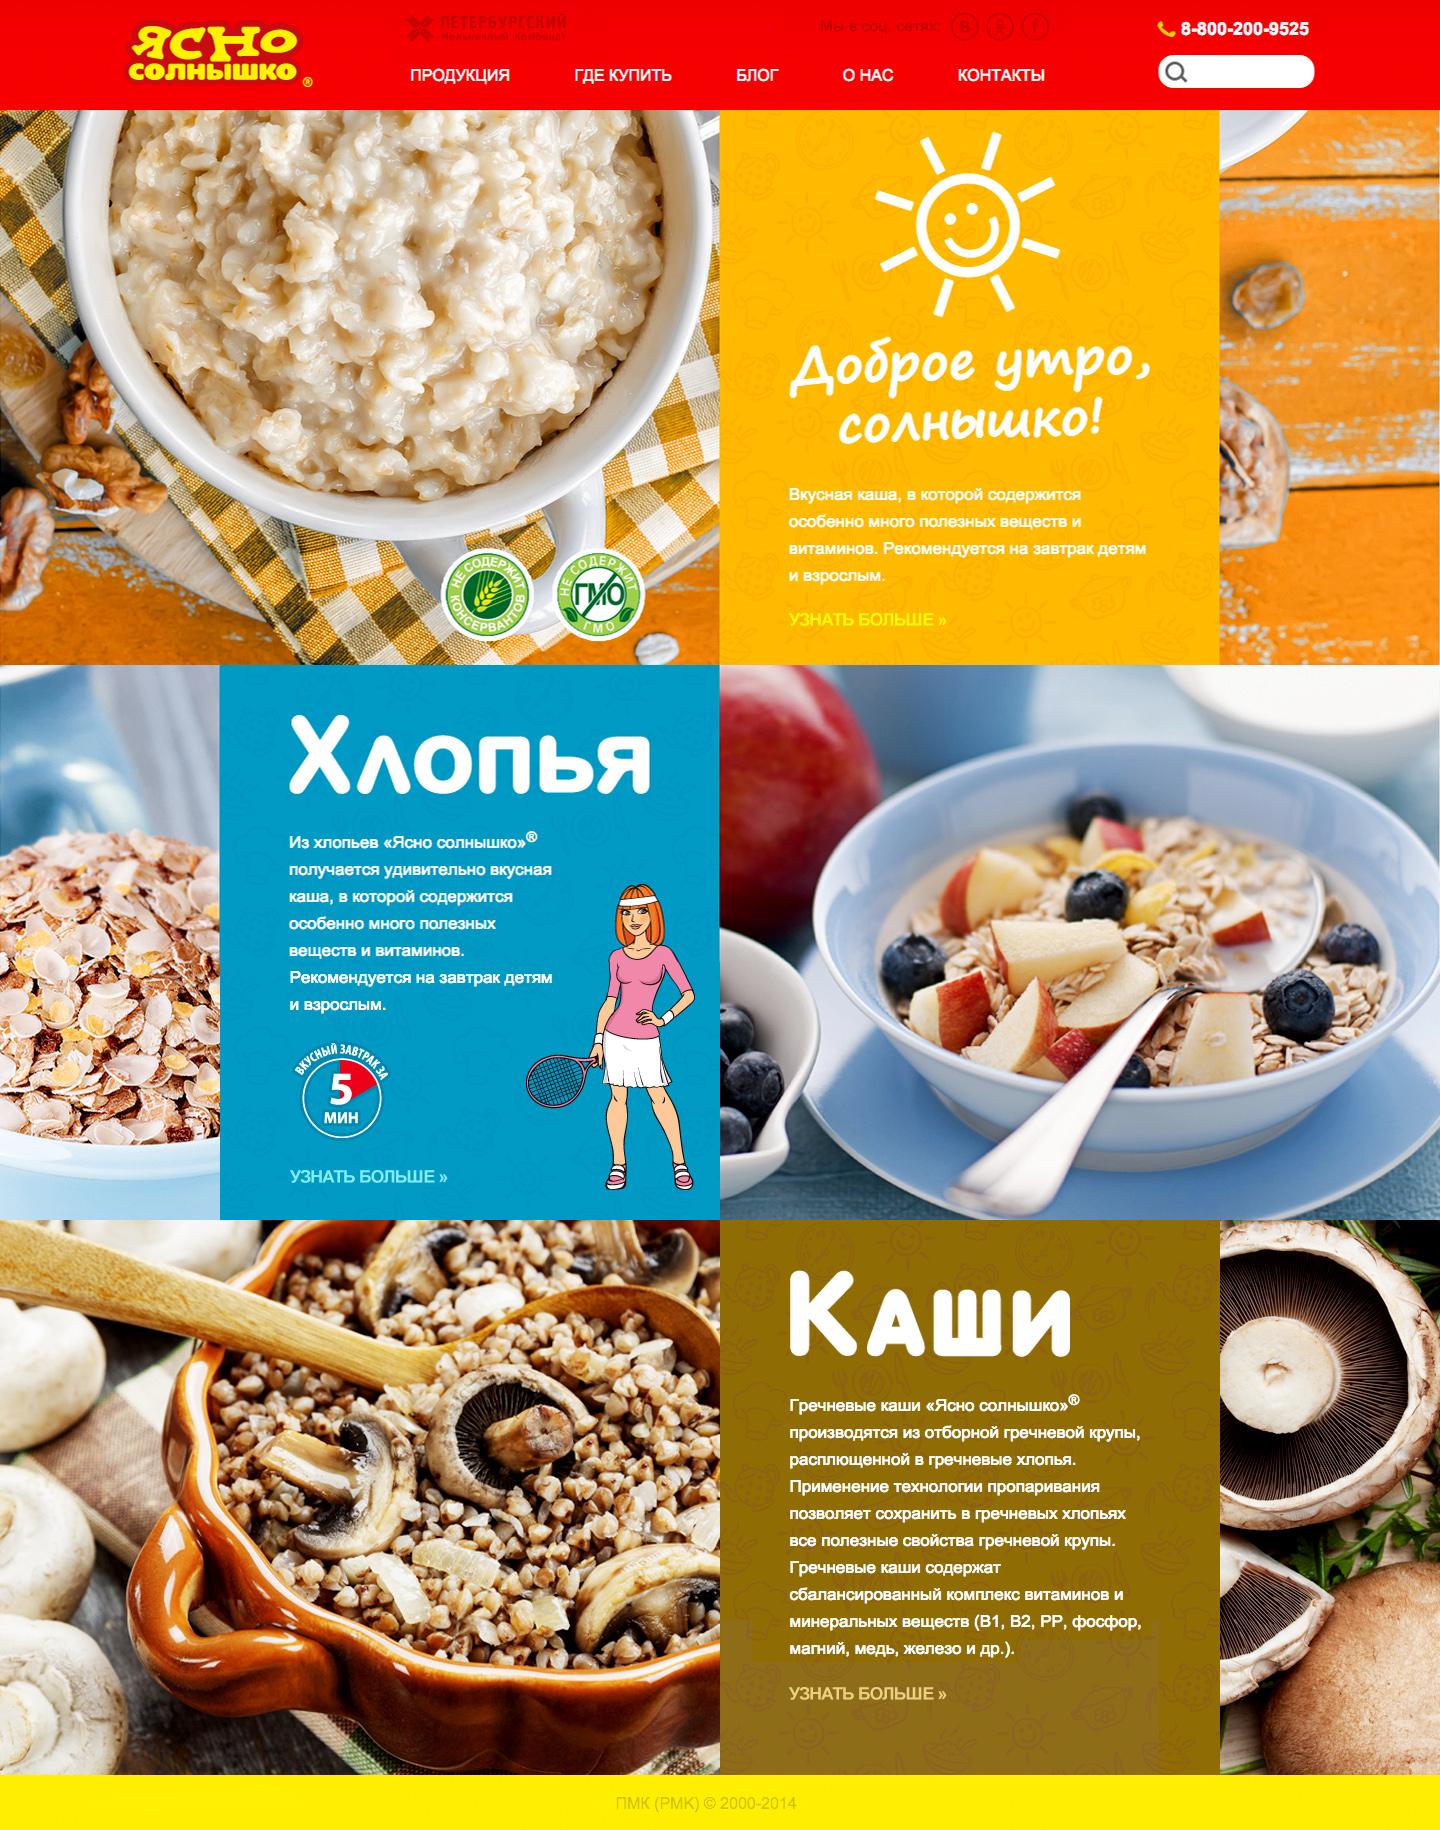 Yasno Solnyshko, Website, Design, Nikita Konkin